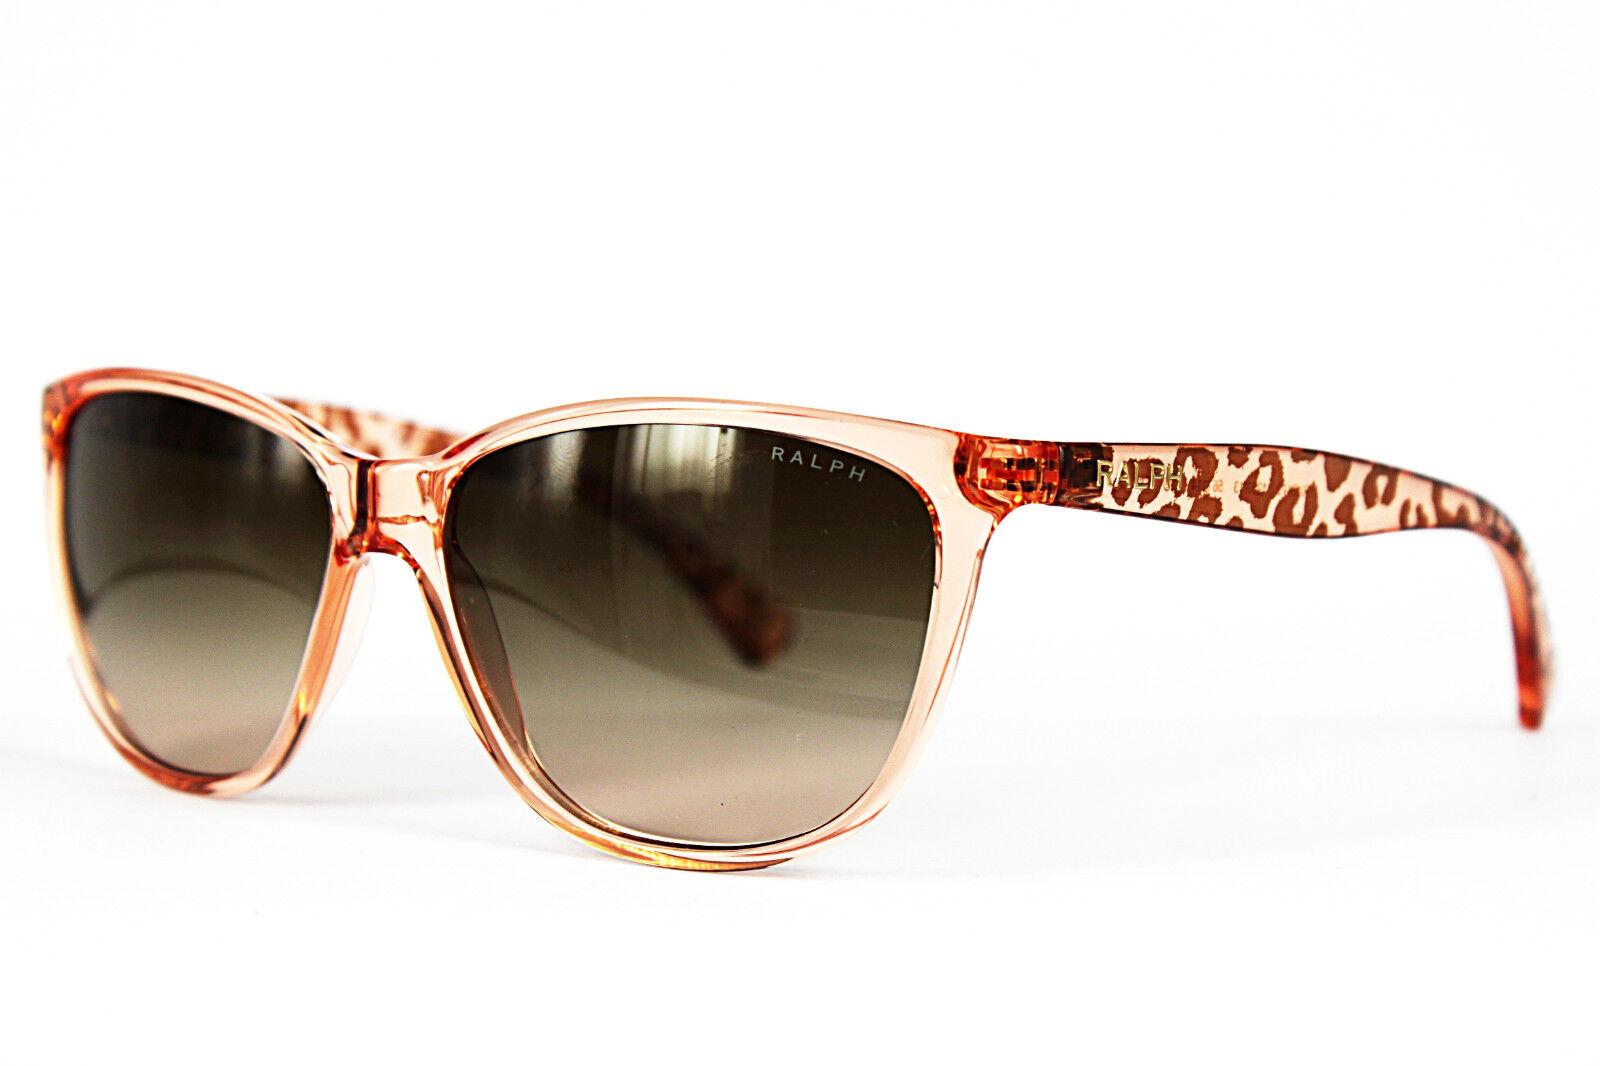 RALPH RalphLauren Sonnenbrille Sunglasses RA5179 RA5179 RA5179 1259 13 Konkursware   473A (30)     | Zahlreiche In Vielfalt  | König der Quantität  | Verbraucher zuerst  48330e